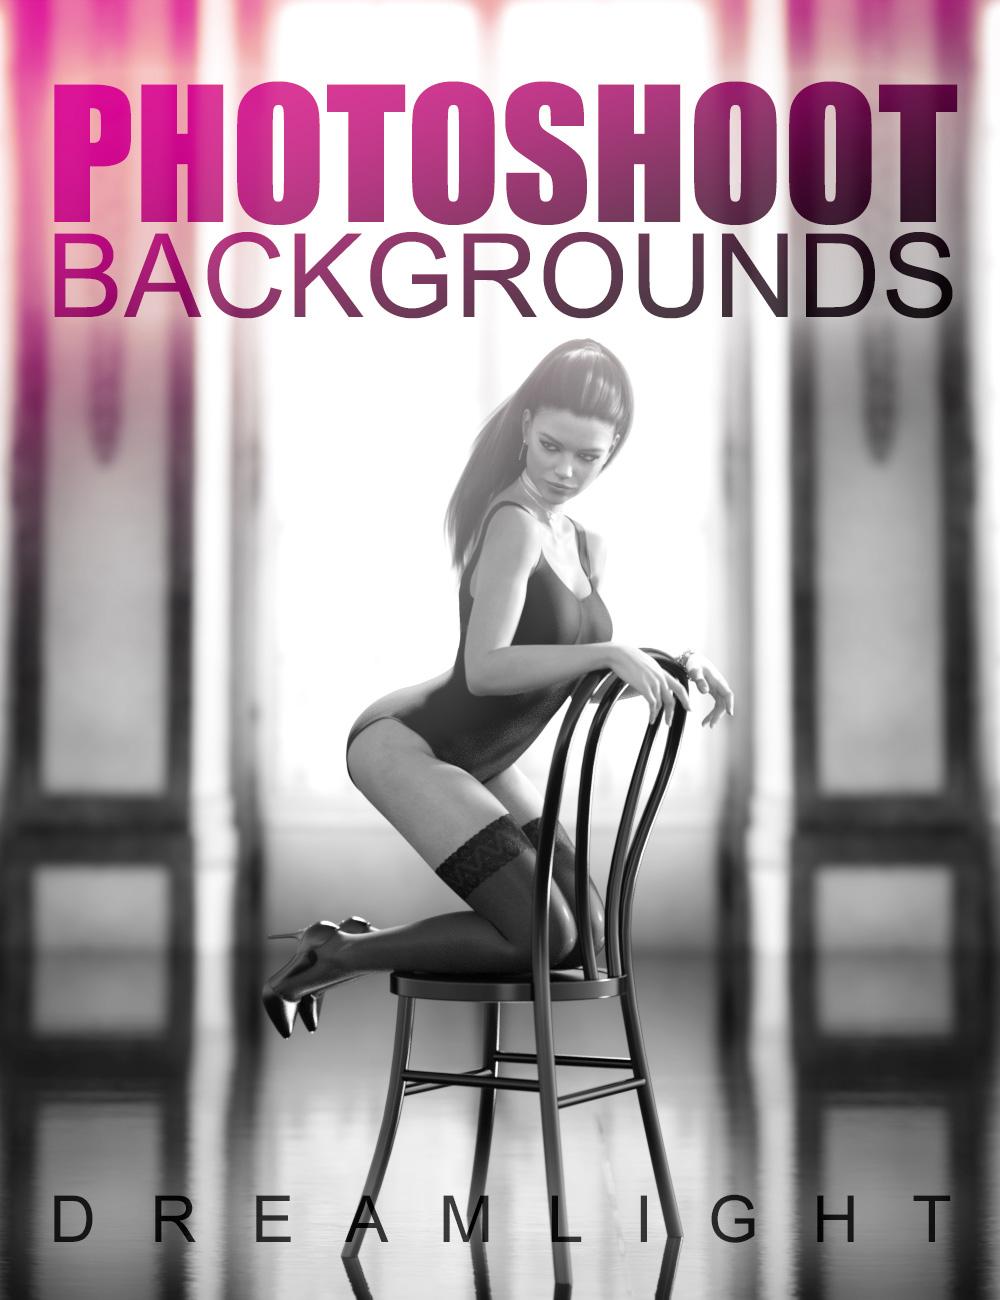 Photoshoot Backgrounds by: Dreamlight, 3D Models by Daz 3D